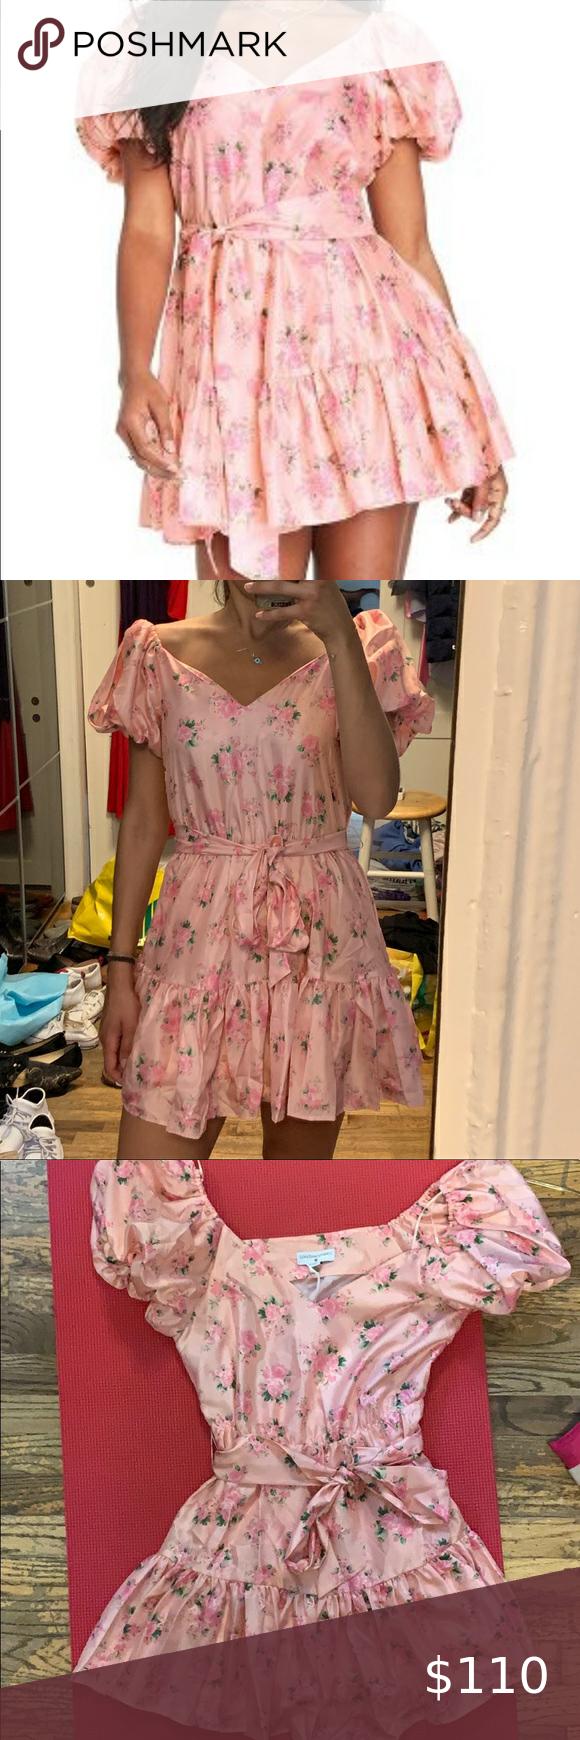 Loveshackfancy For Target Mini Floral Pink Dress Mini Floral Loveshackfancy For Target Dress With Tie Waist Size 2 Neve Pink Dress Pink Floral Dress Dresses [ 1740 x 580 Pixel ]